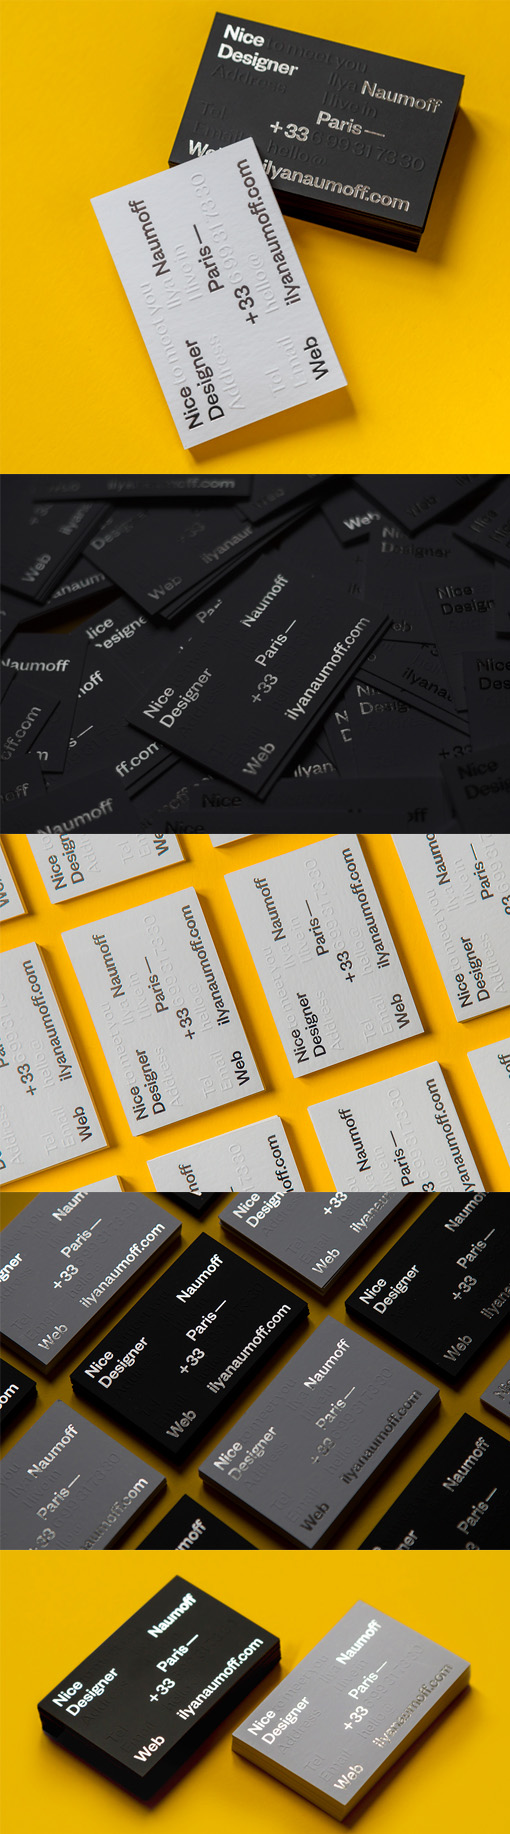 Bold Silver Foil On Black Business Card For A Graphic Designer